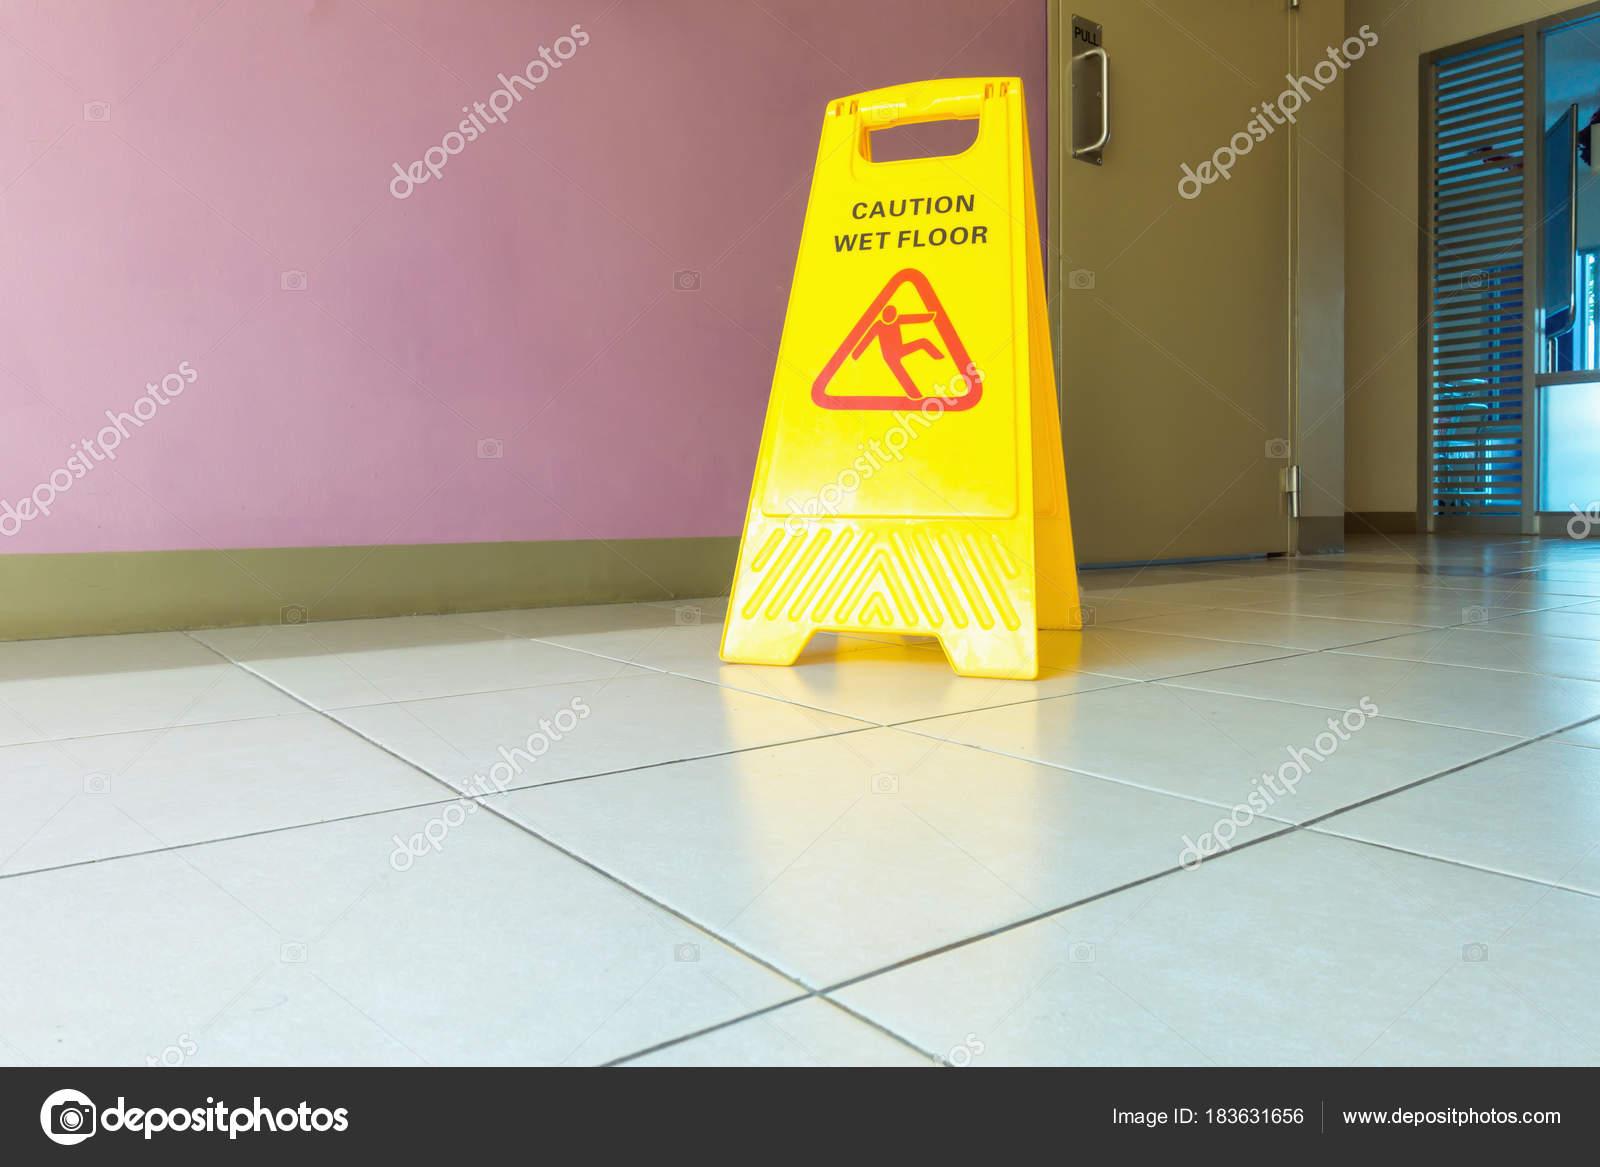 Fußbodenbelag Im Flur ~ Vorsicht nass bodenbelag schild auf dem flur u stockfoto k d p